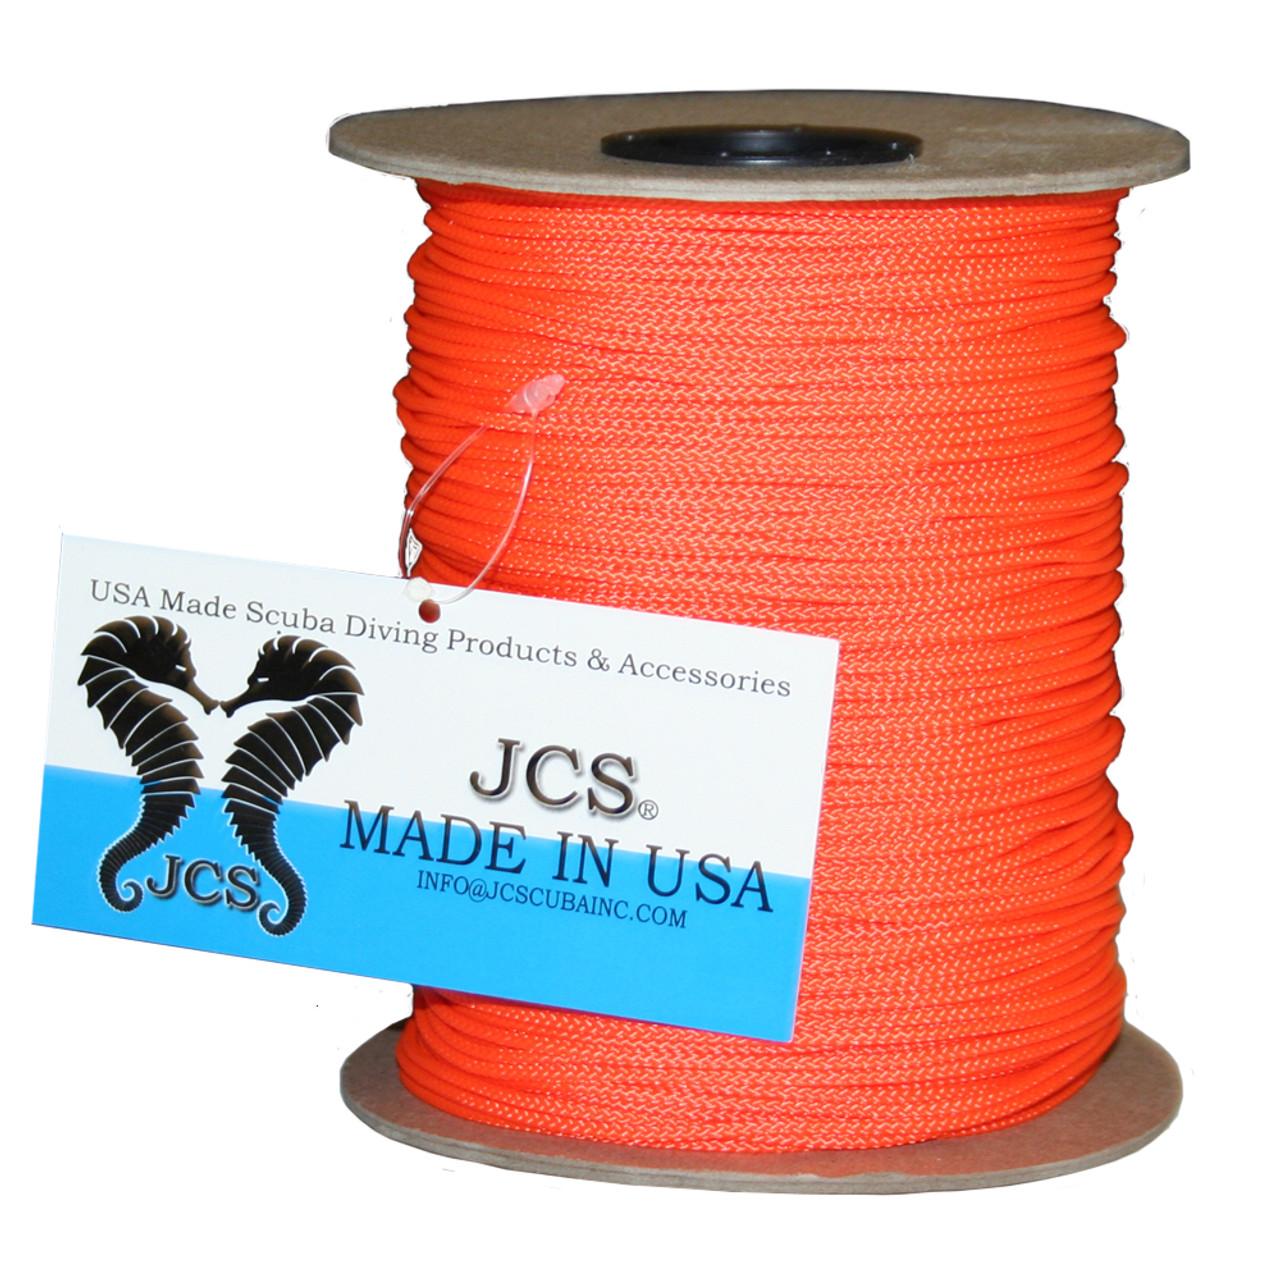 #24 Nylon Braided Reel Line, 1 LB Spool, 650 Feet (200 Meters), 3 Colors